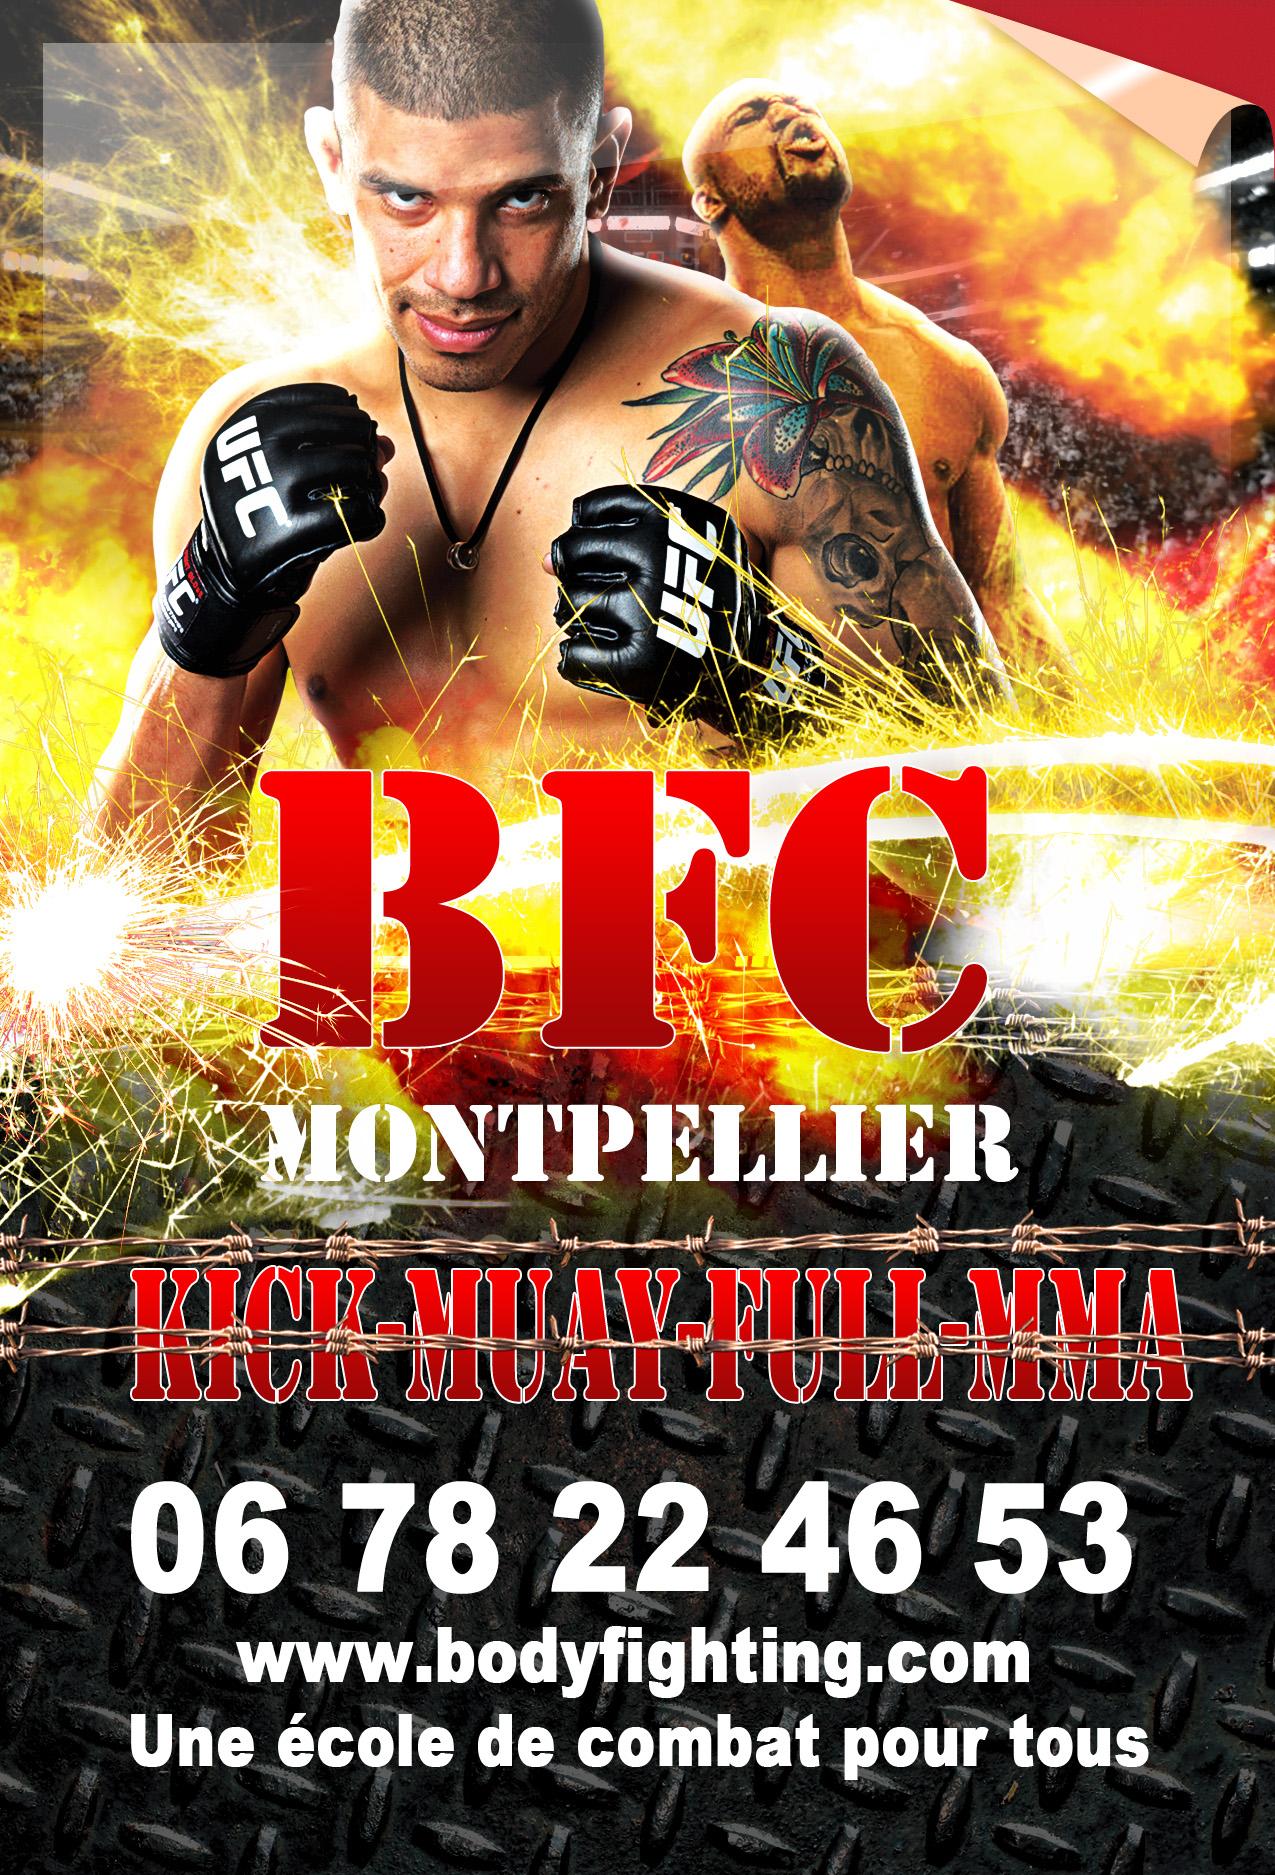 KICKBOXING-BOXE THAI-FULL-MMA À MONTPELLIER AU BODYFIGHTING CLUB